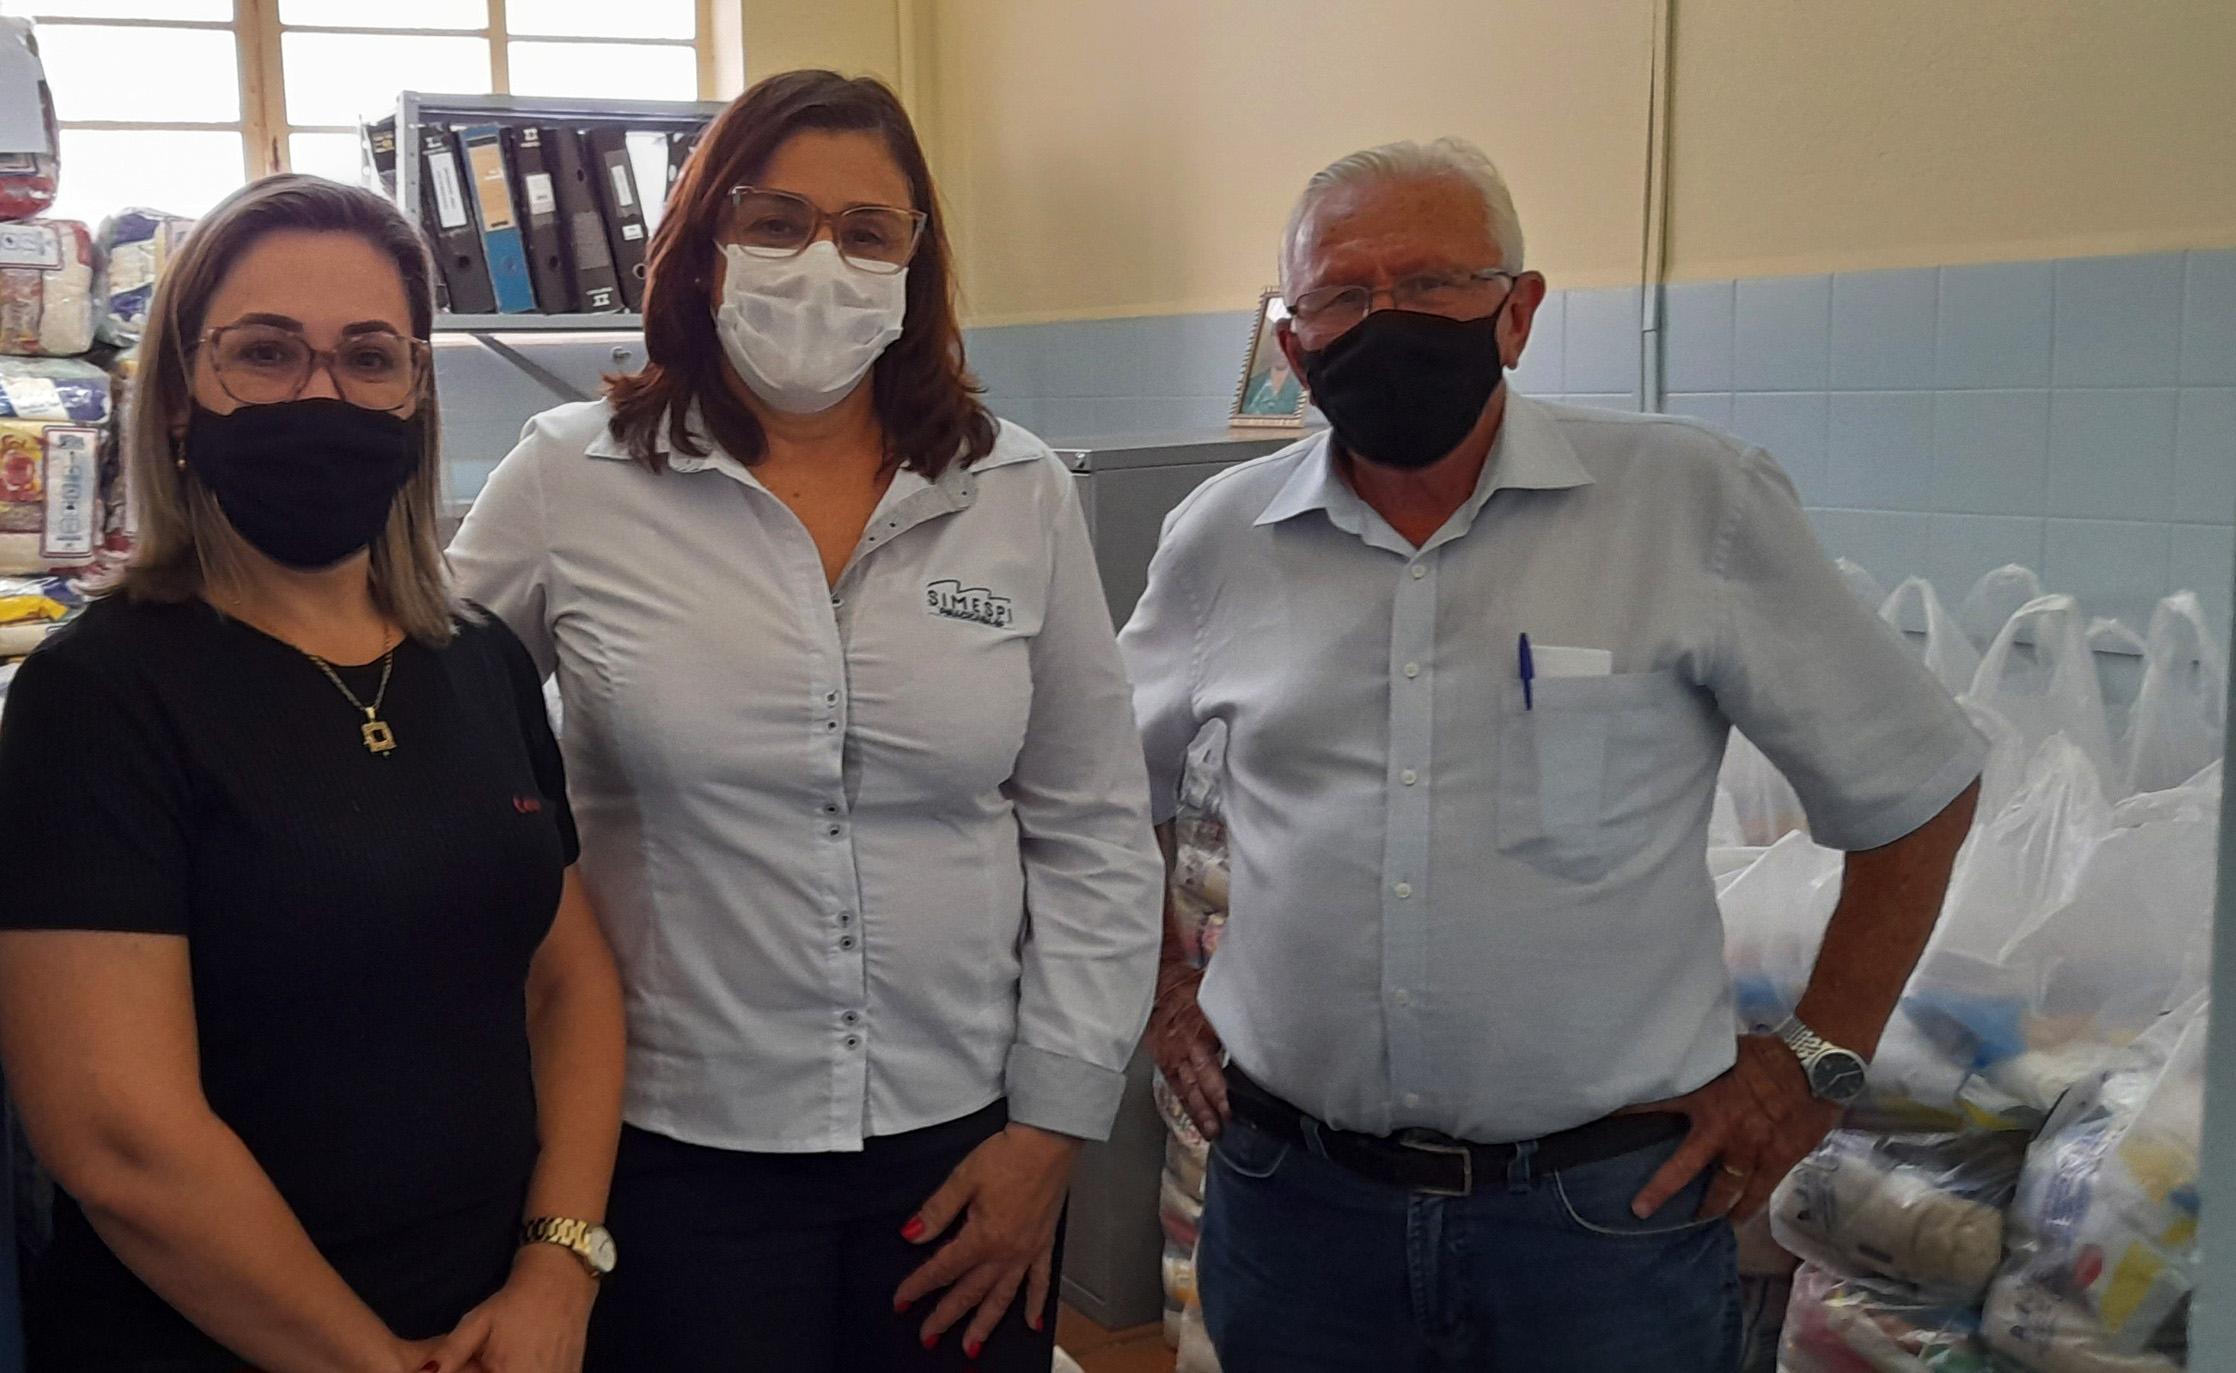 Simespi doa mais de 300 cestas básicas para Prefeitura de Rio das Pedras